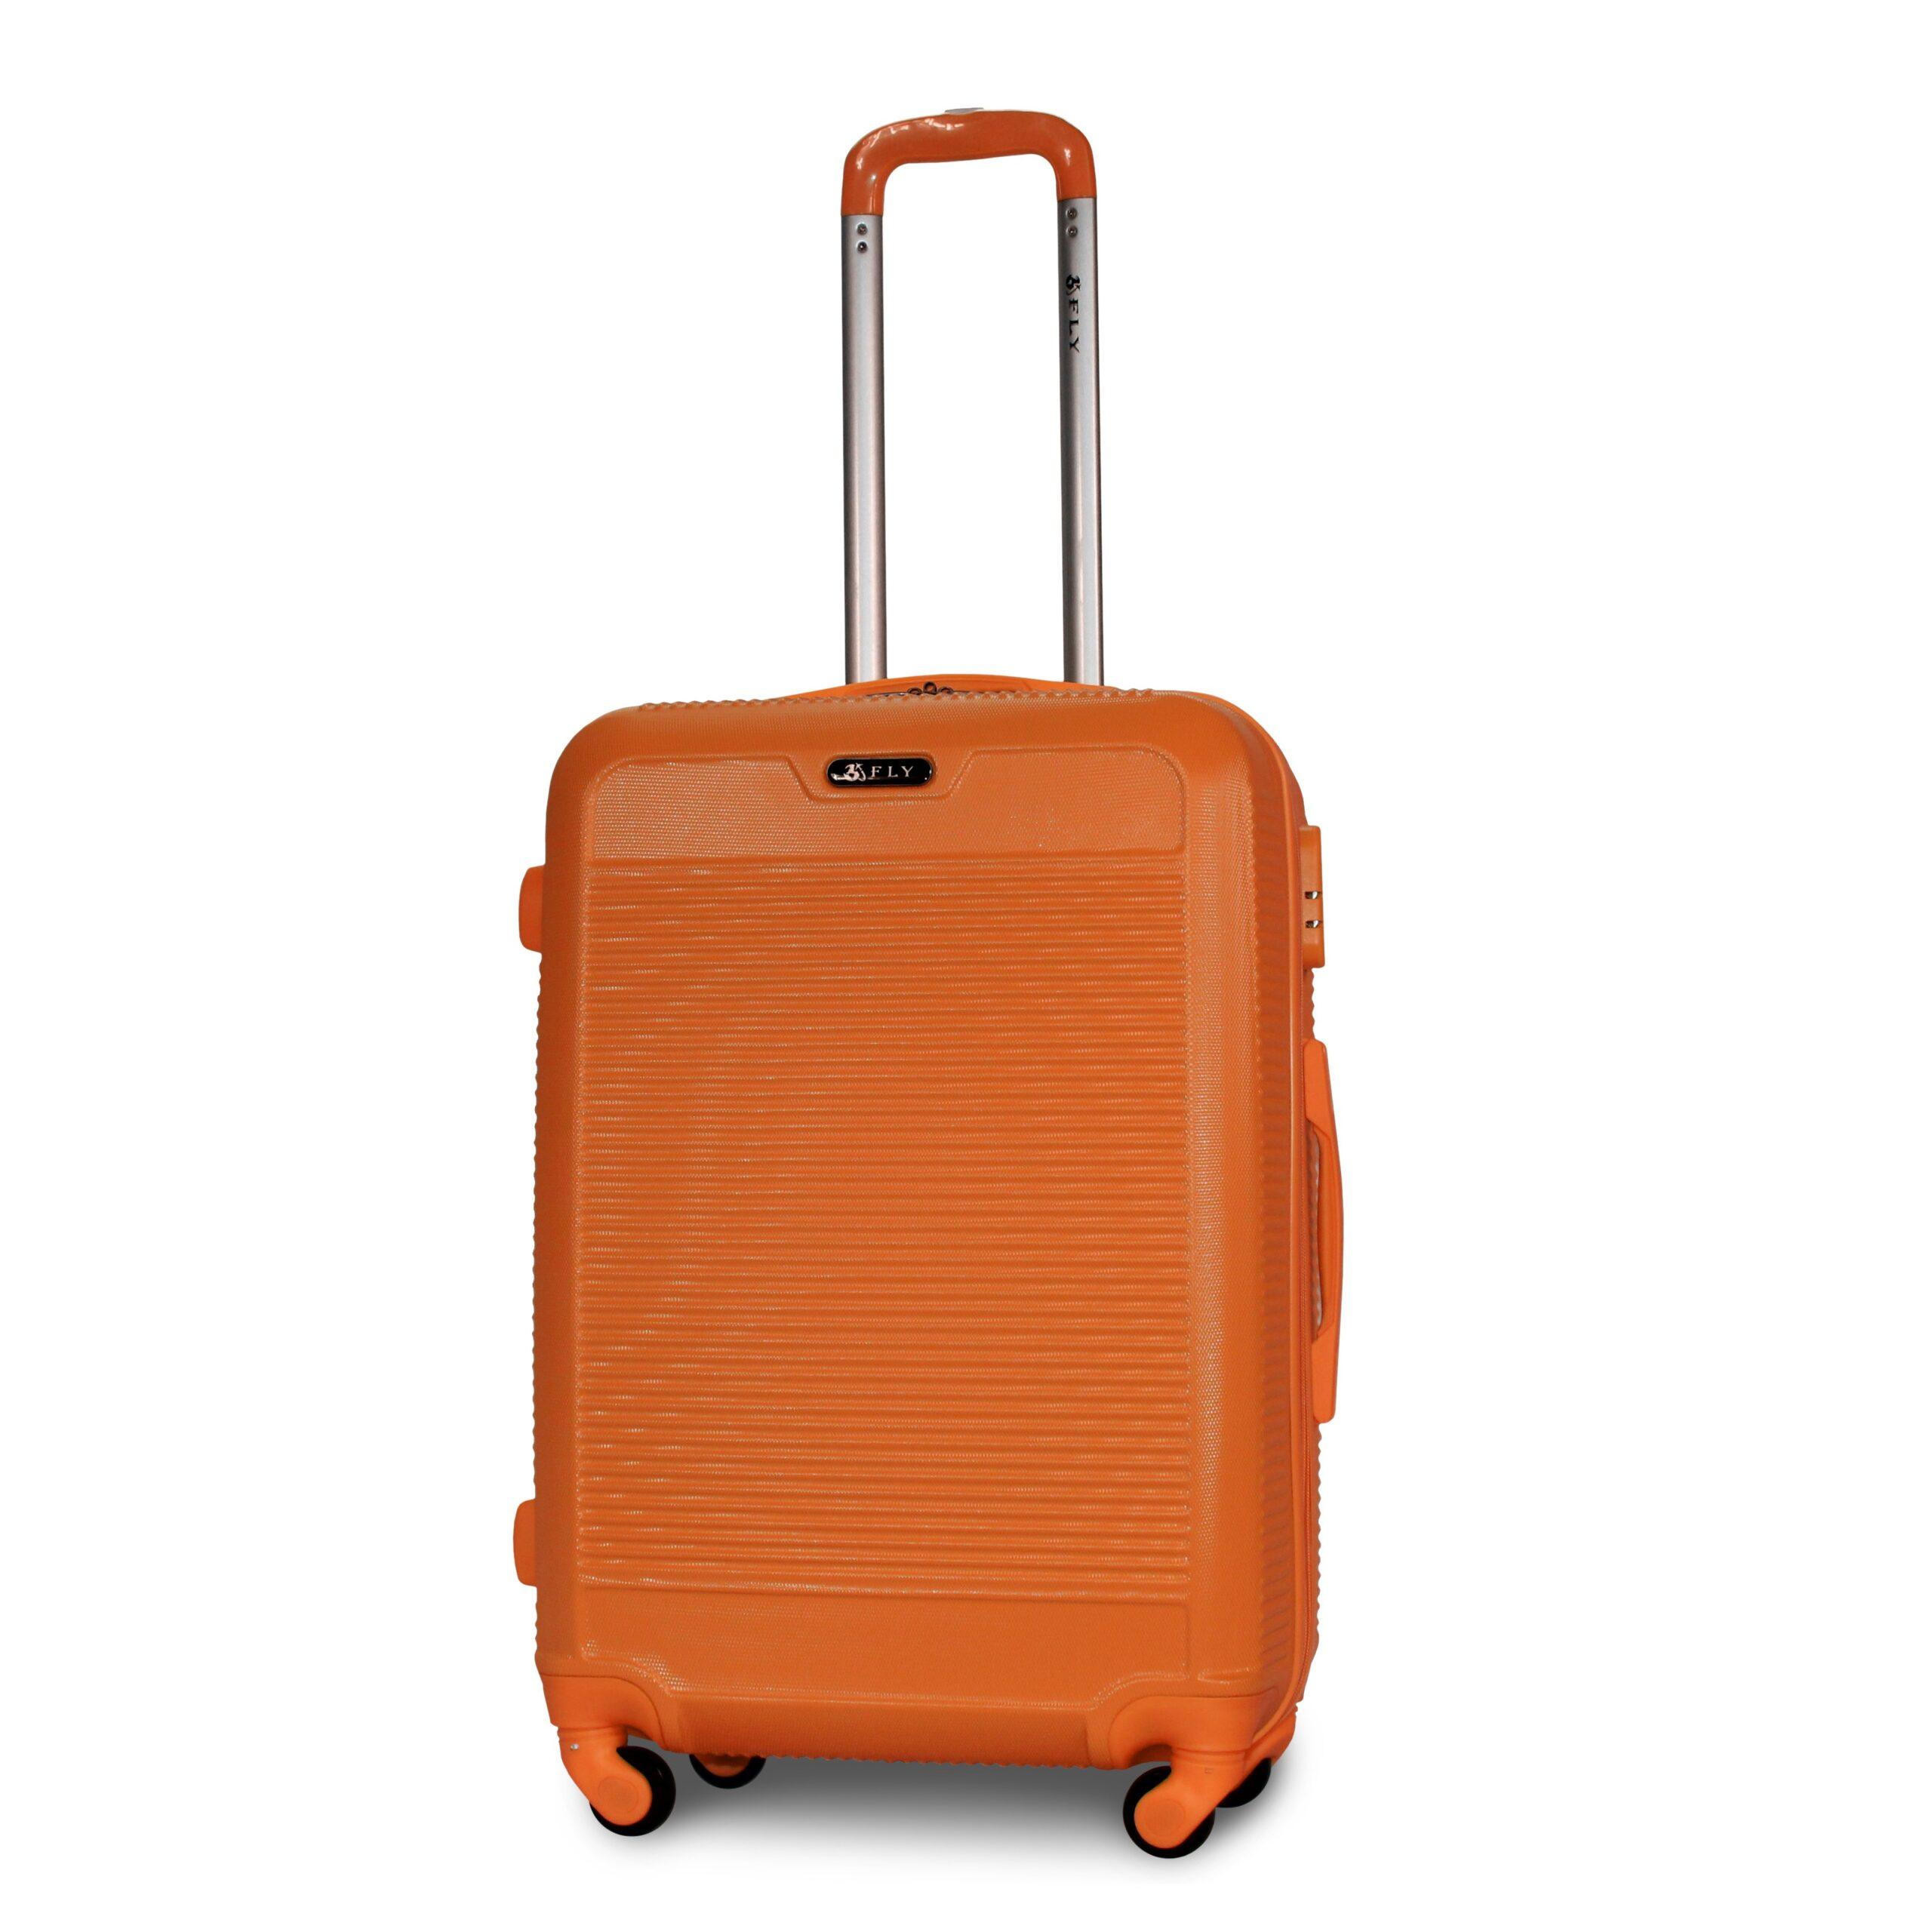 Средний чемодан Fly 1093-F | пластиковый